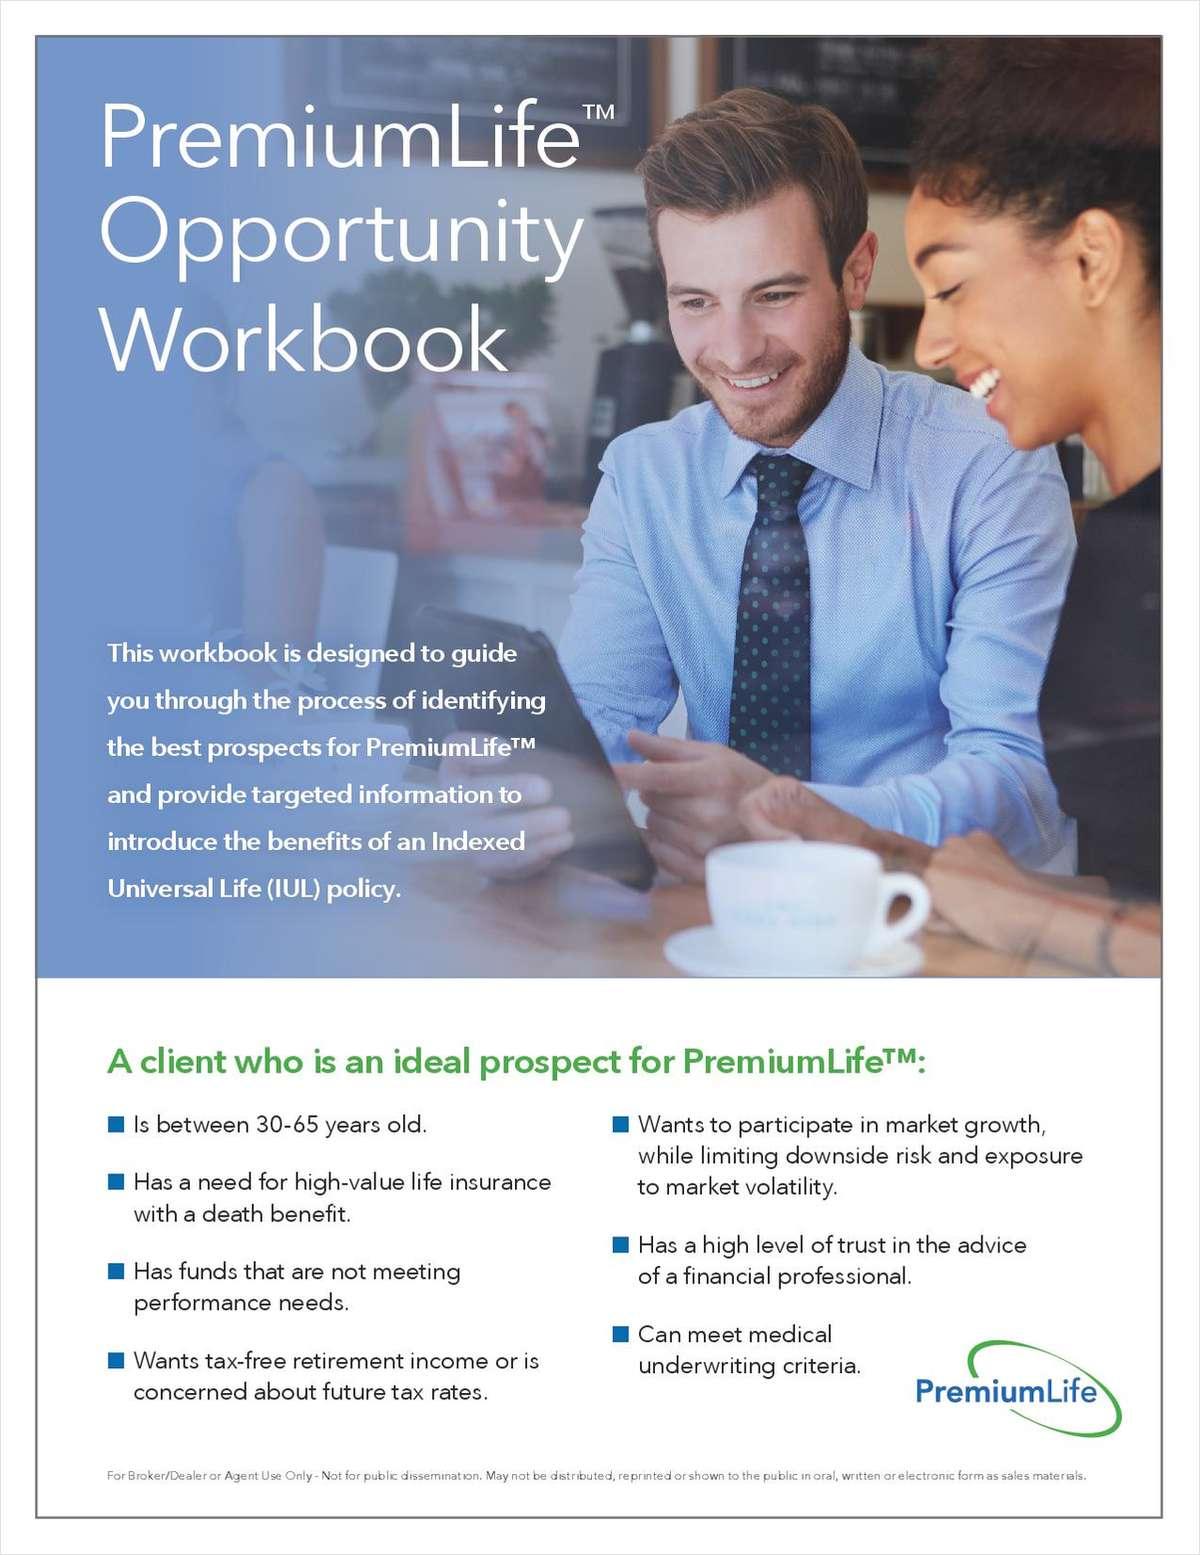 Premium Financing Opportunity Workbook